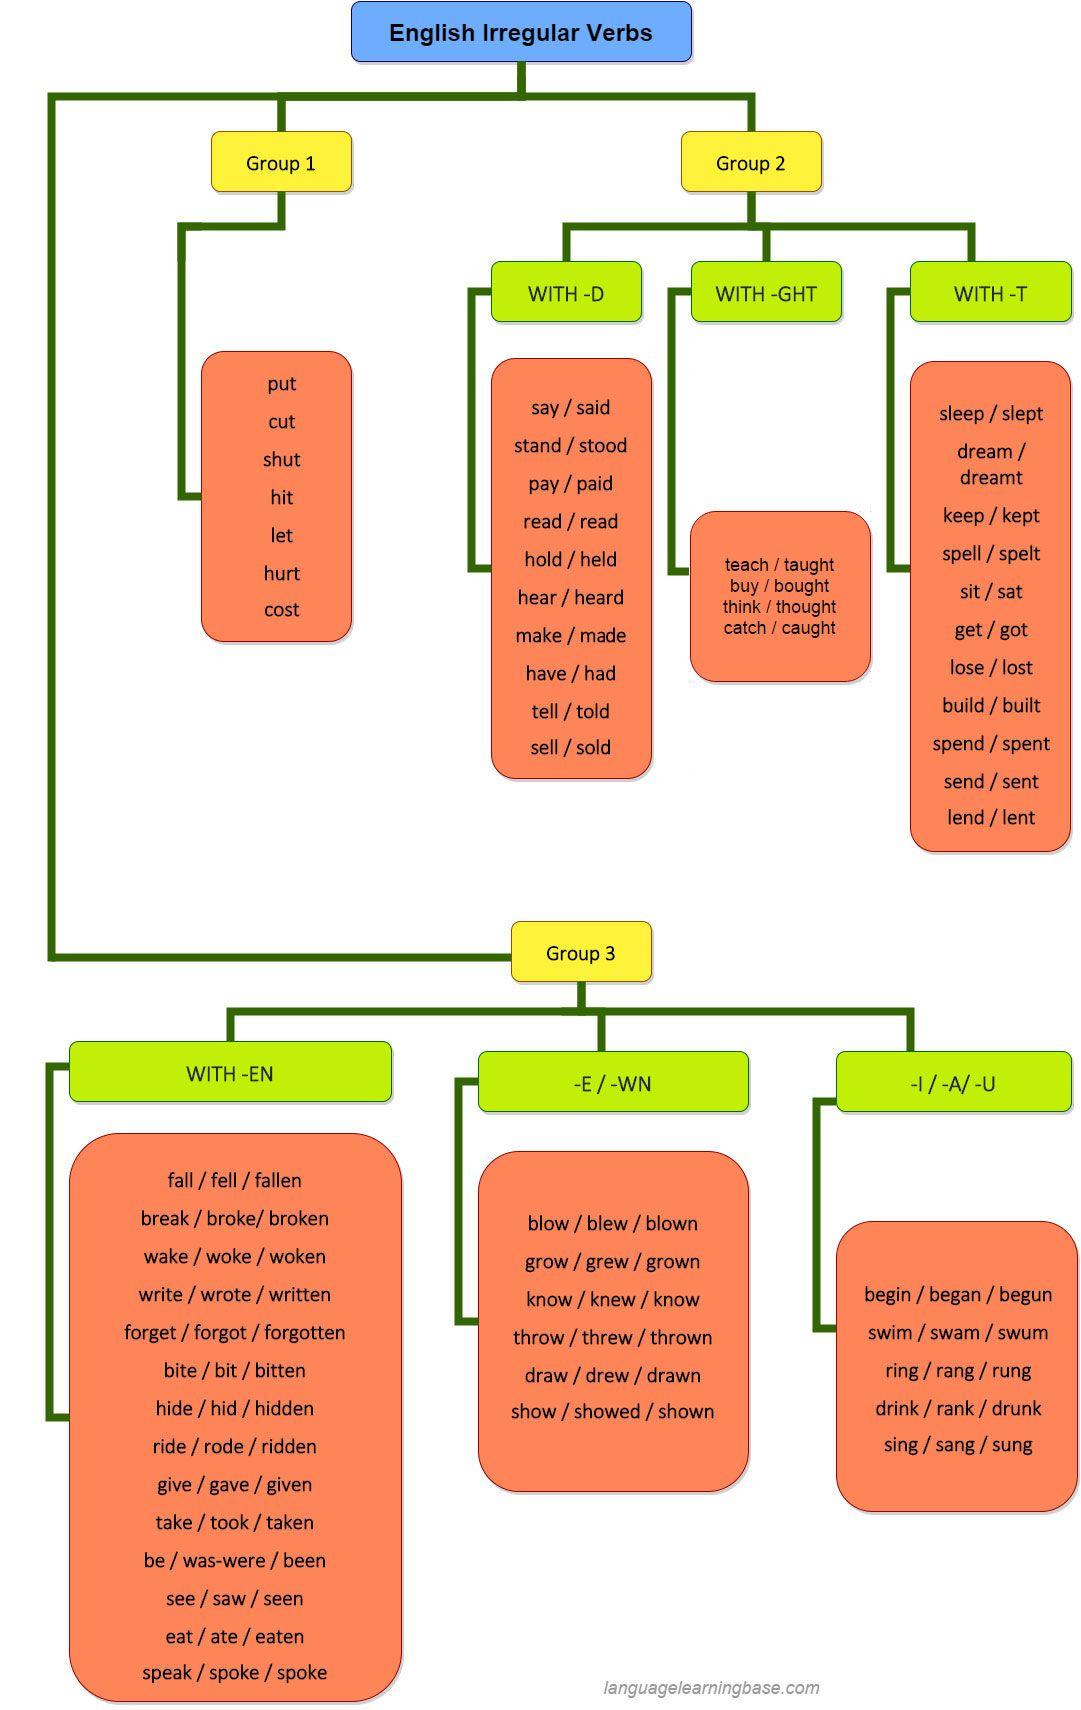 Great chart for learning irregular verbs learn englishgrammarverbs irregularenglish also englishgrammar rh pinterest